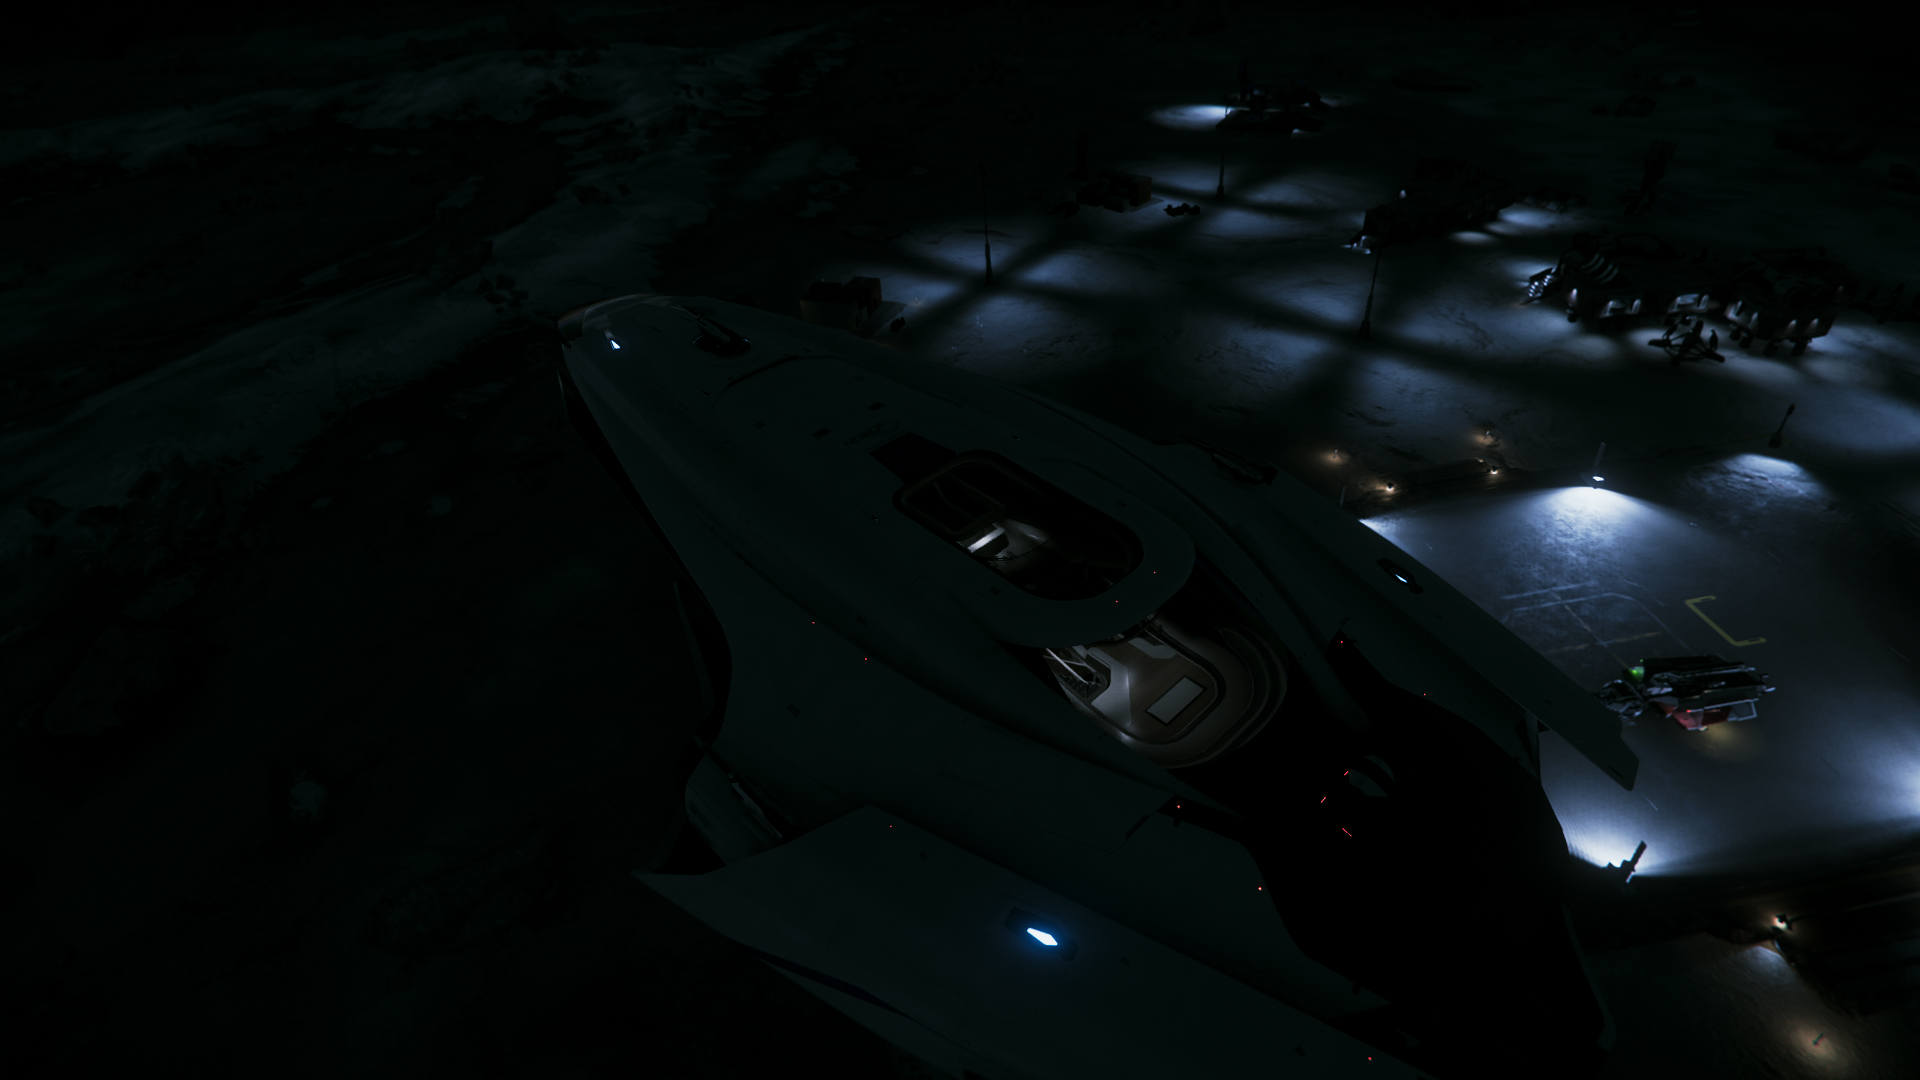 Squadron 42 - Star Citizen Screenshot 2018.08.06 - 19.39.12.50.png